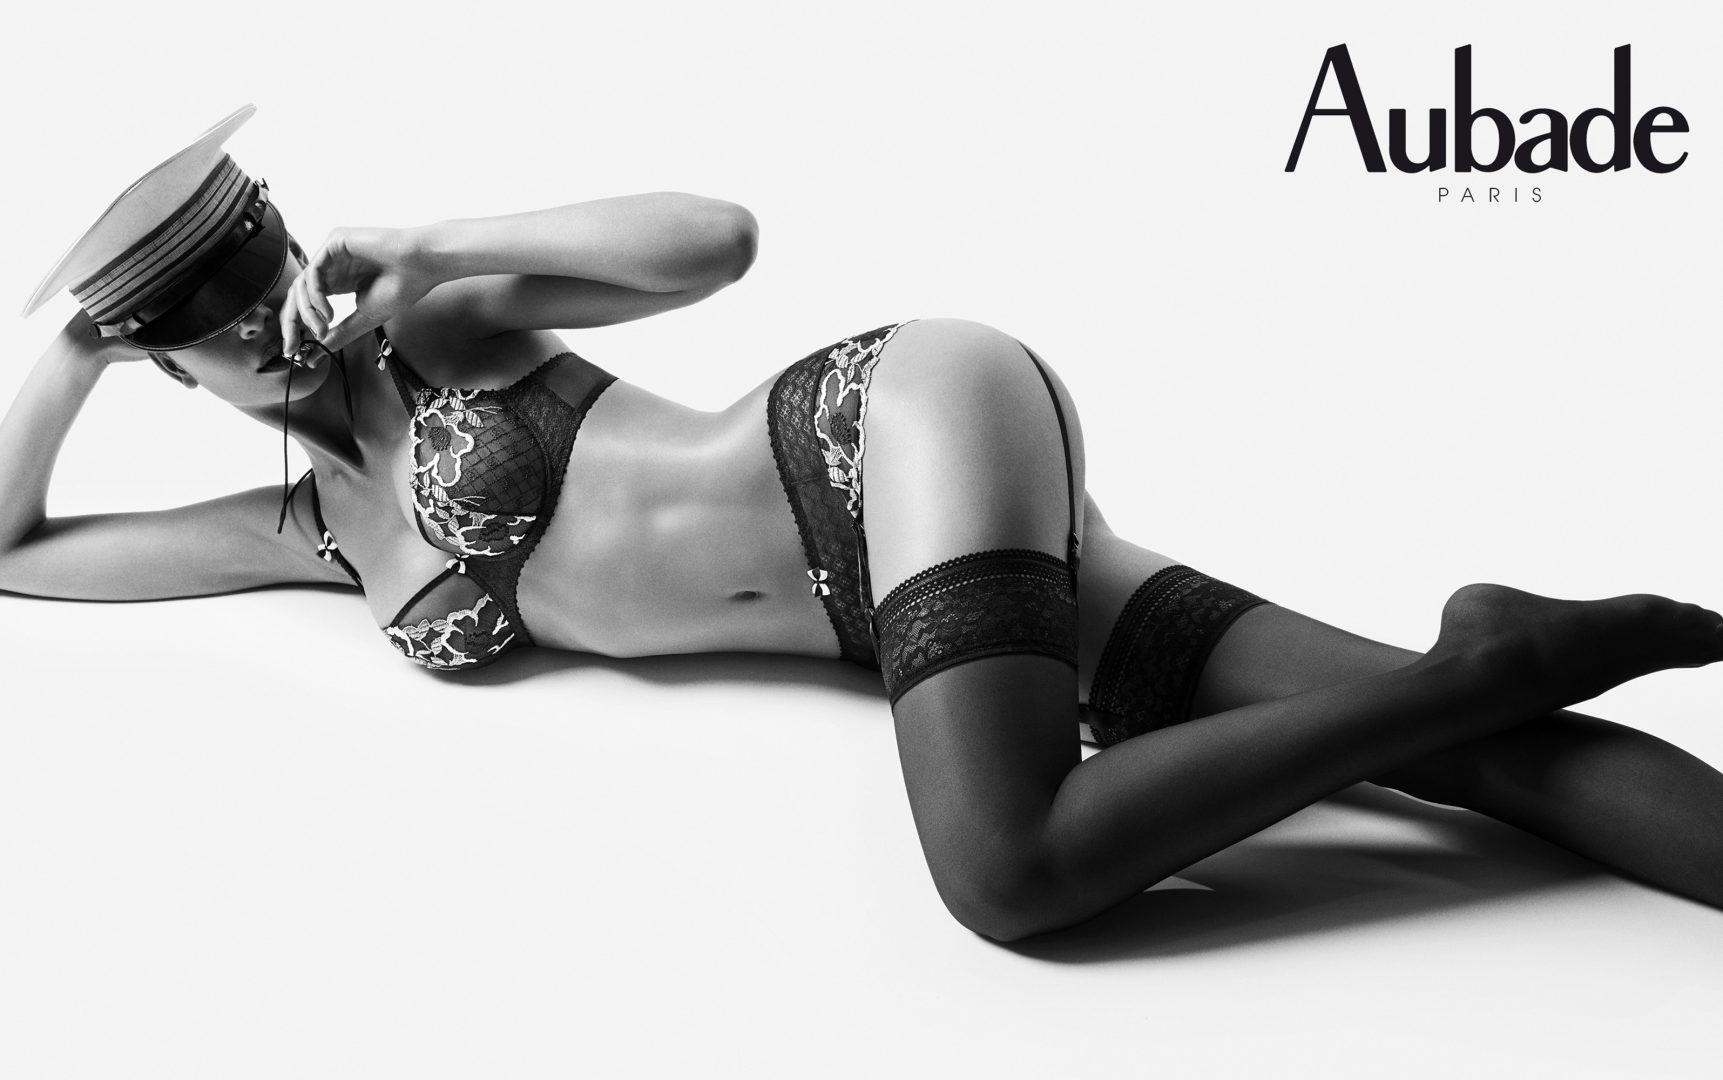 Aubade lingerie campaign by Stefan Rappo